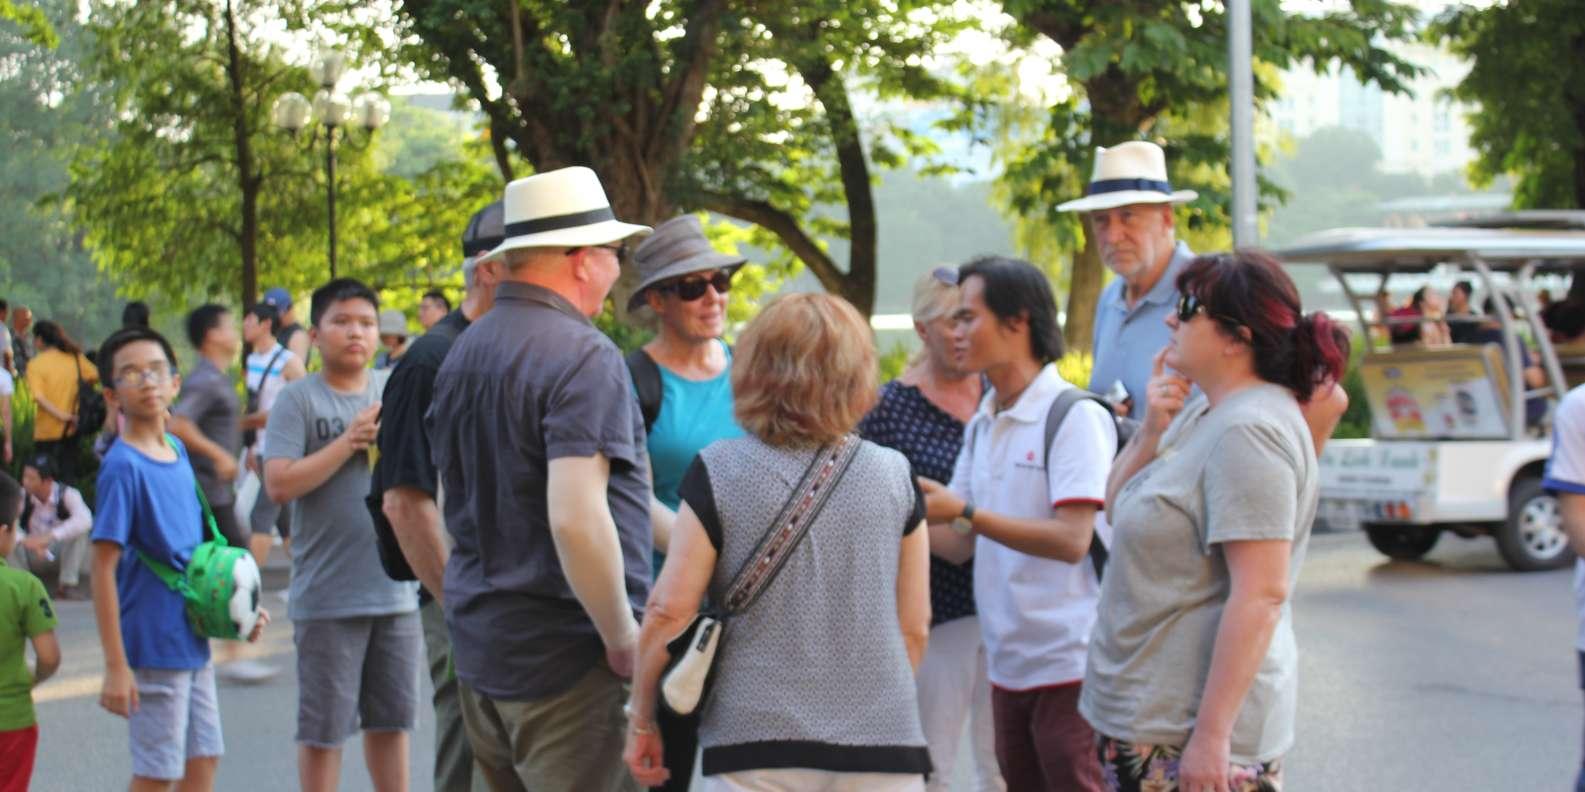 Join the free walking tour in Hoan Kiem Lake